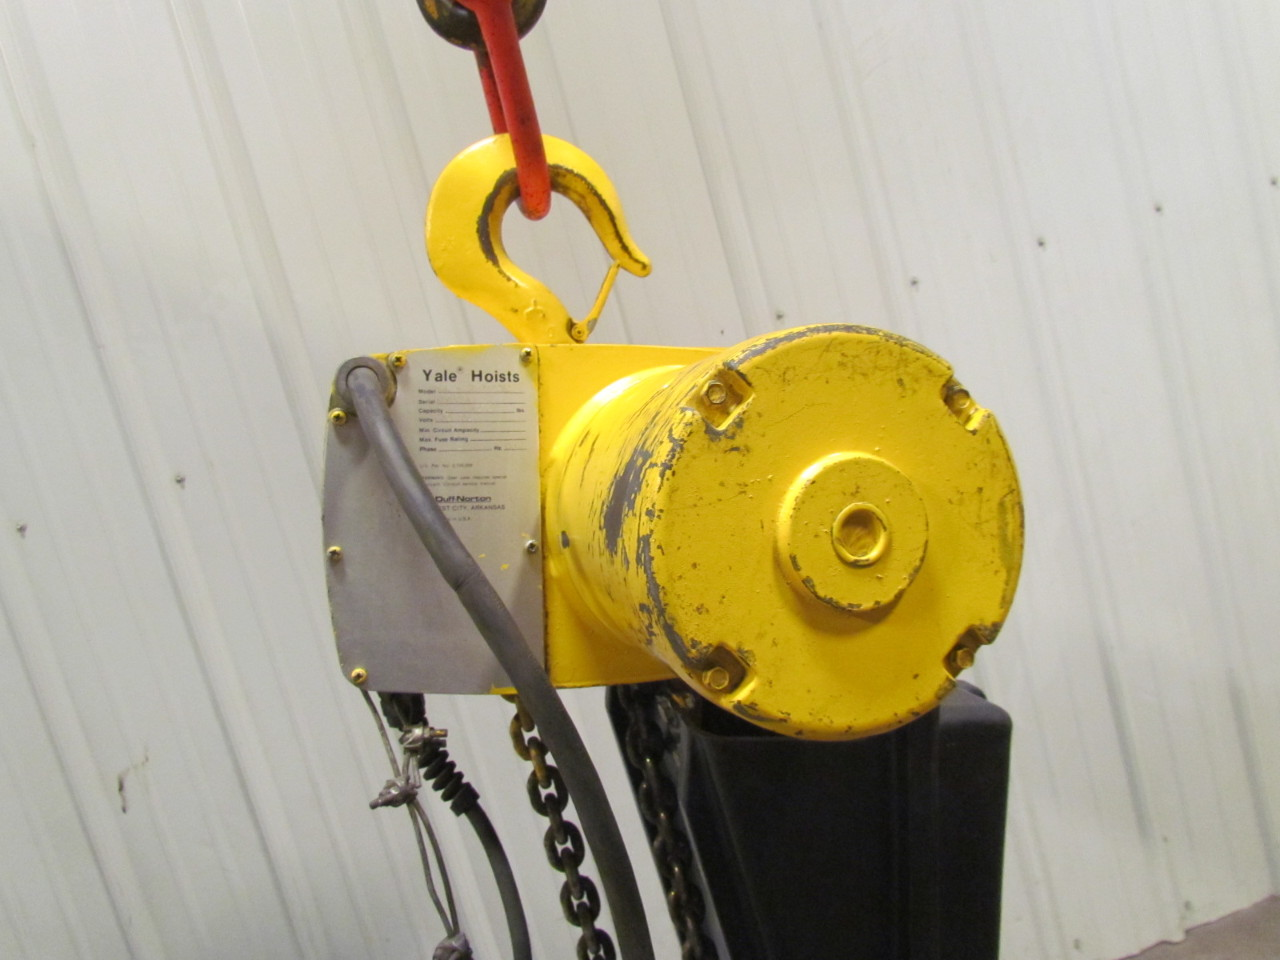 hight resolution of yale hoist wiring diagrams schlage lock repair diagrams yale chain hoist wiring diagram yale hoist chain